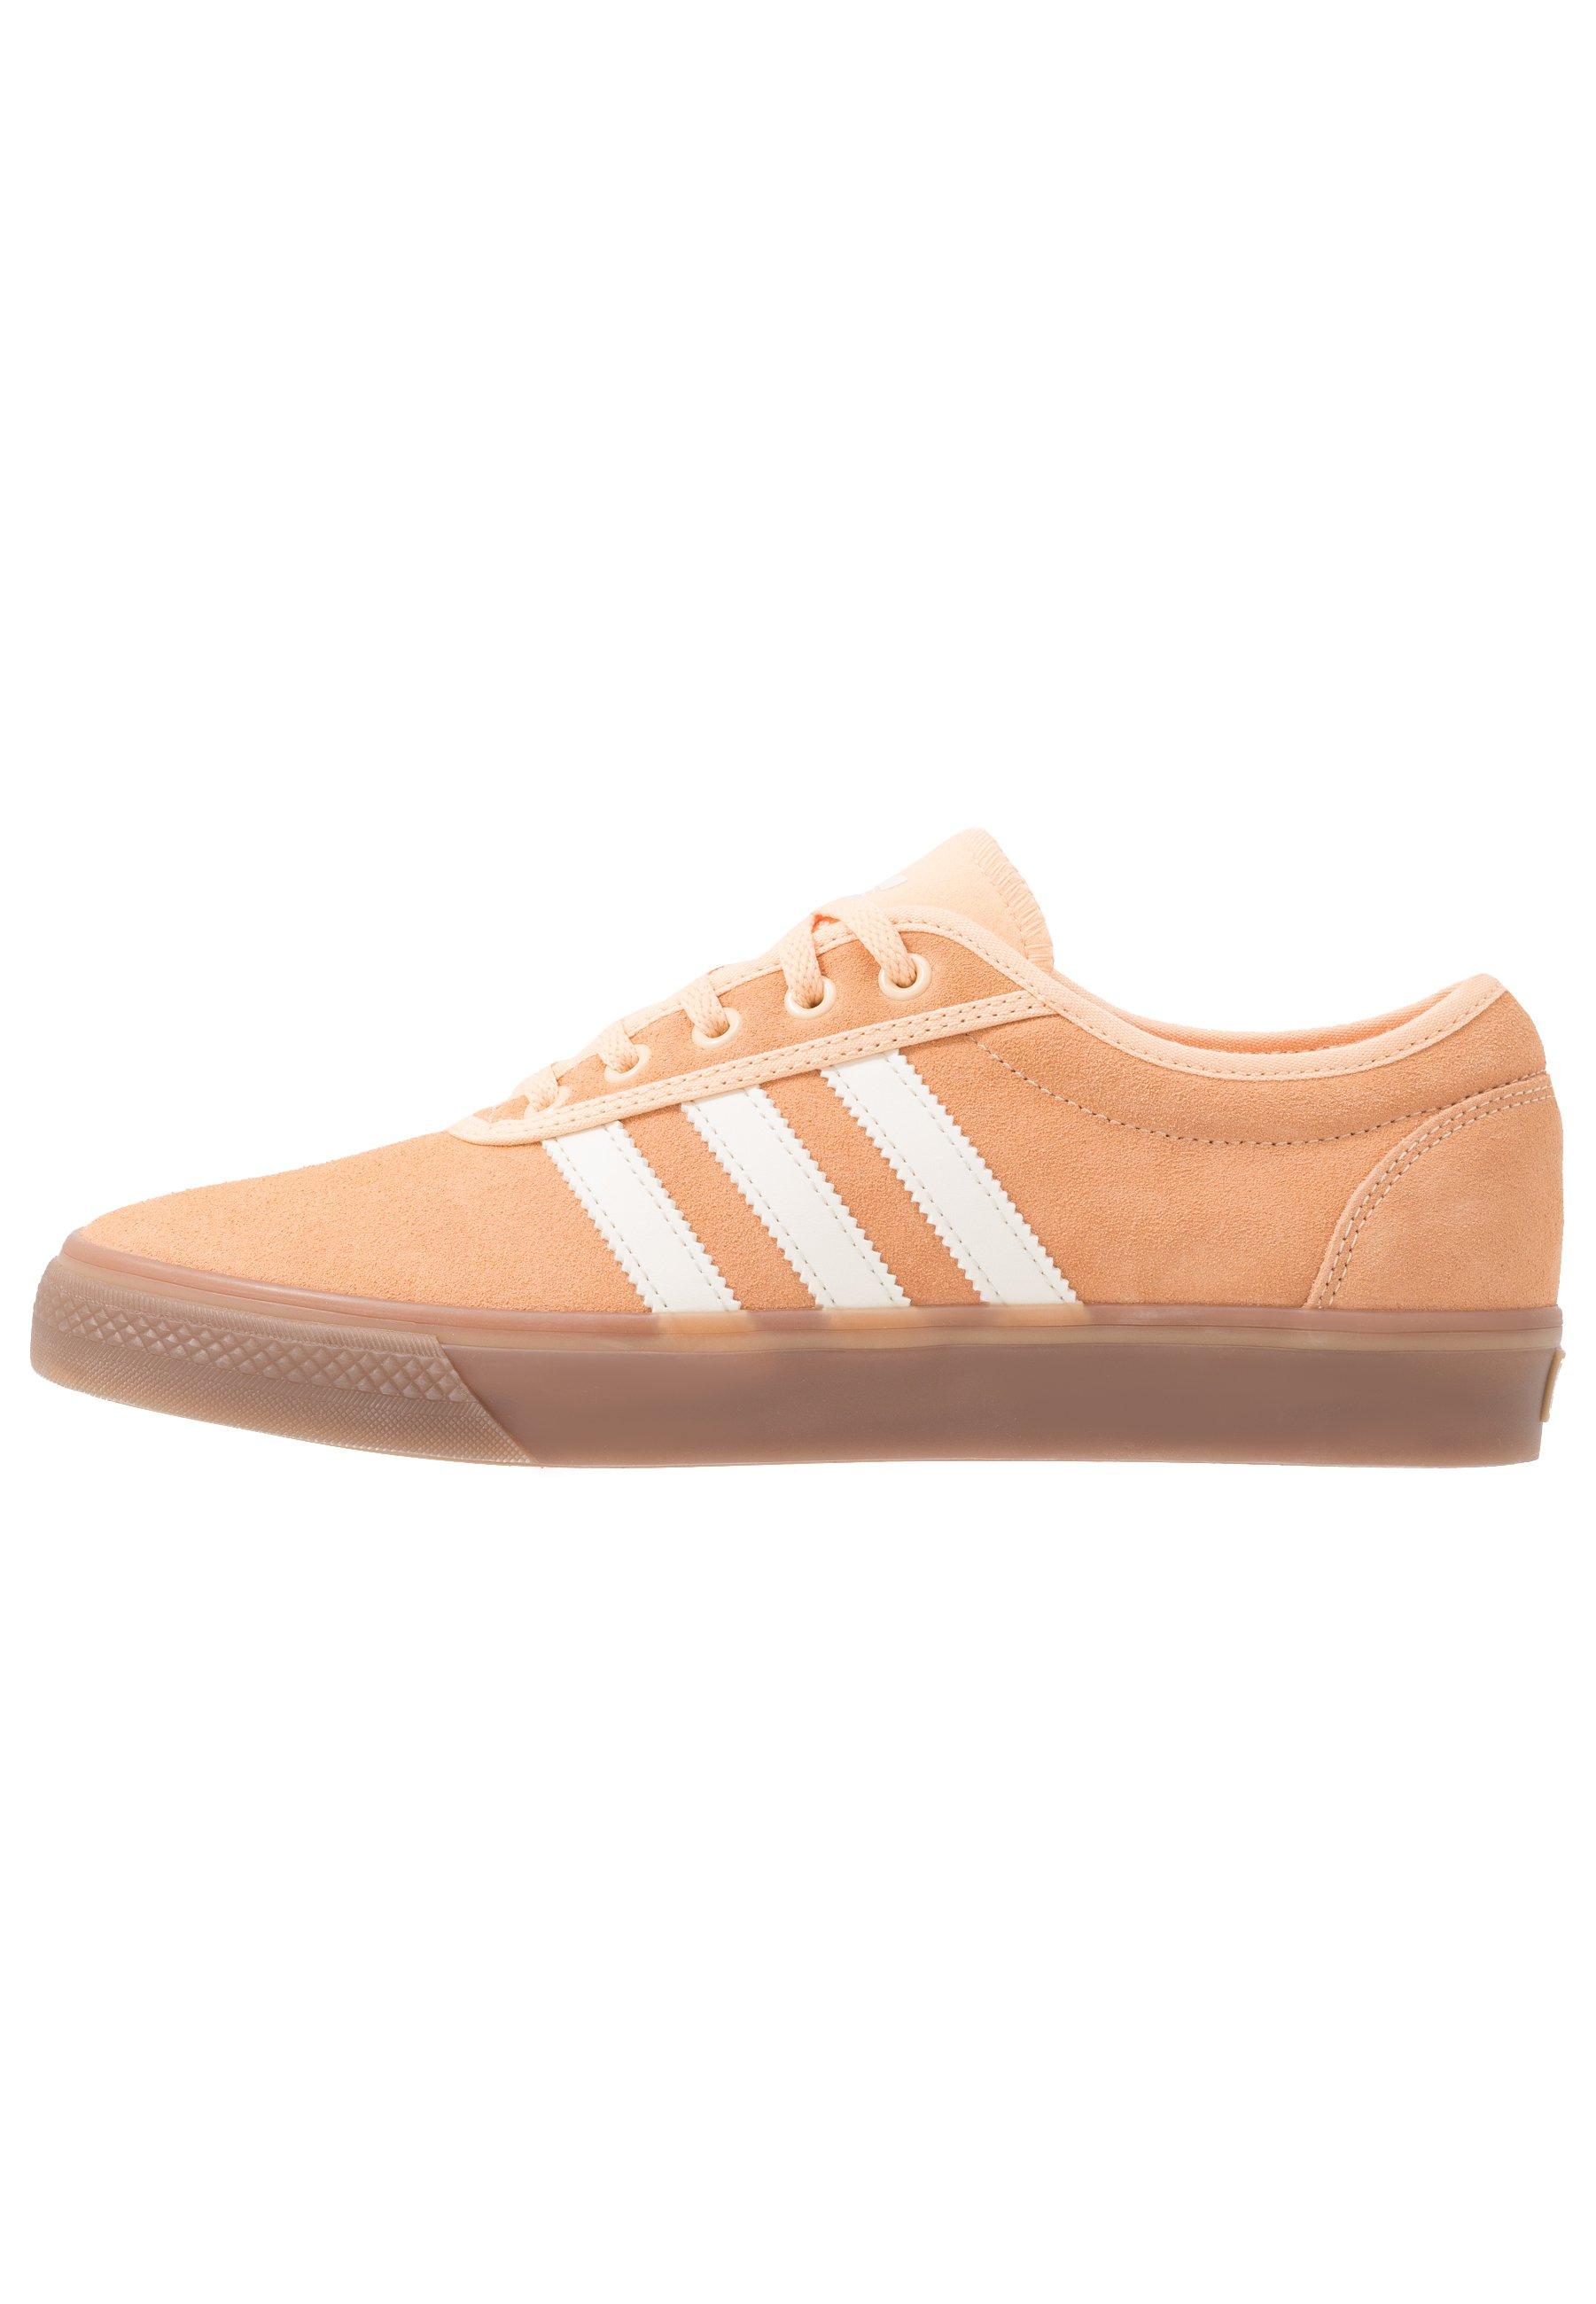 Adidas Originals Adi-ease - Trainers Glow Orange/white